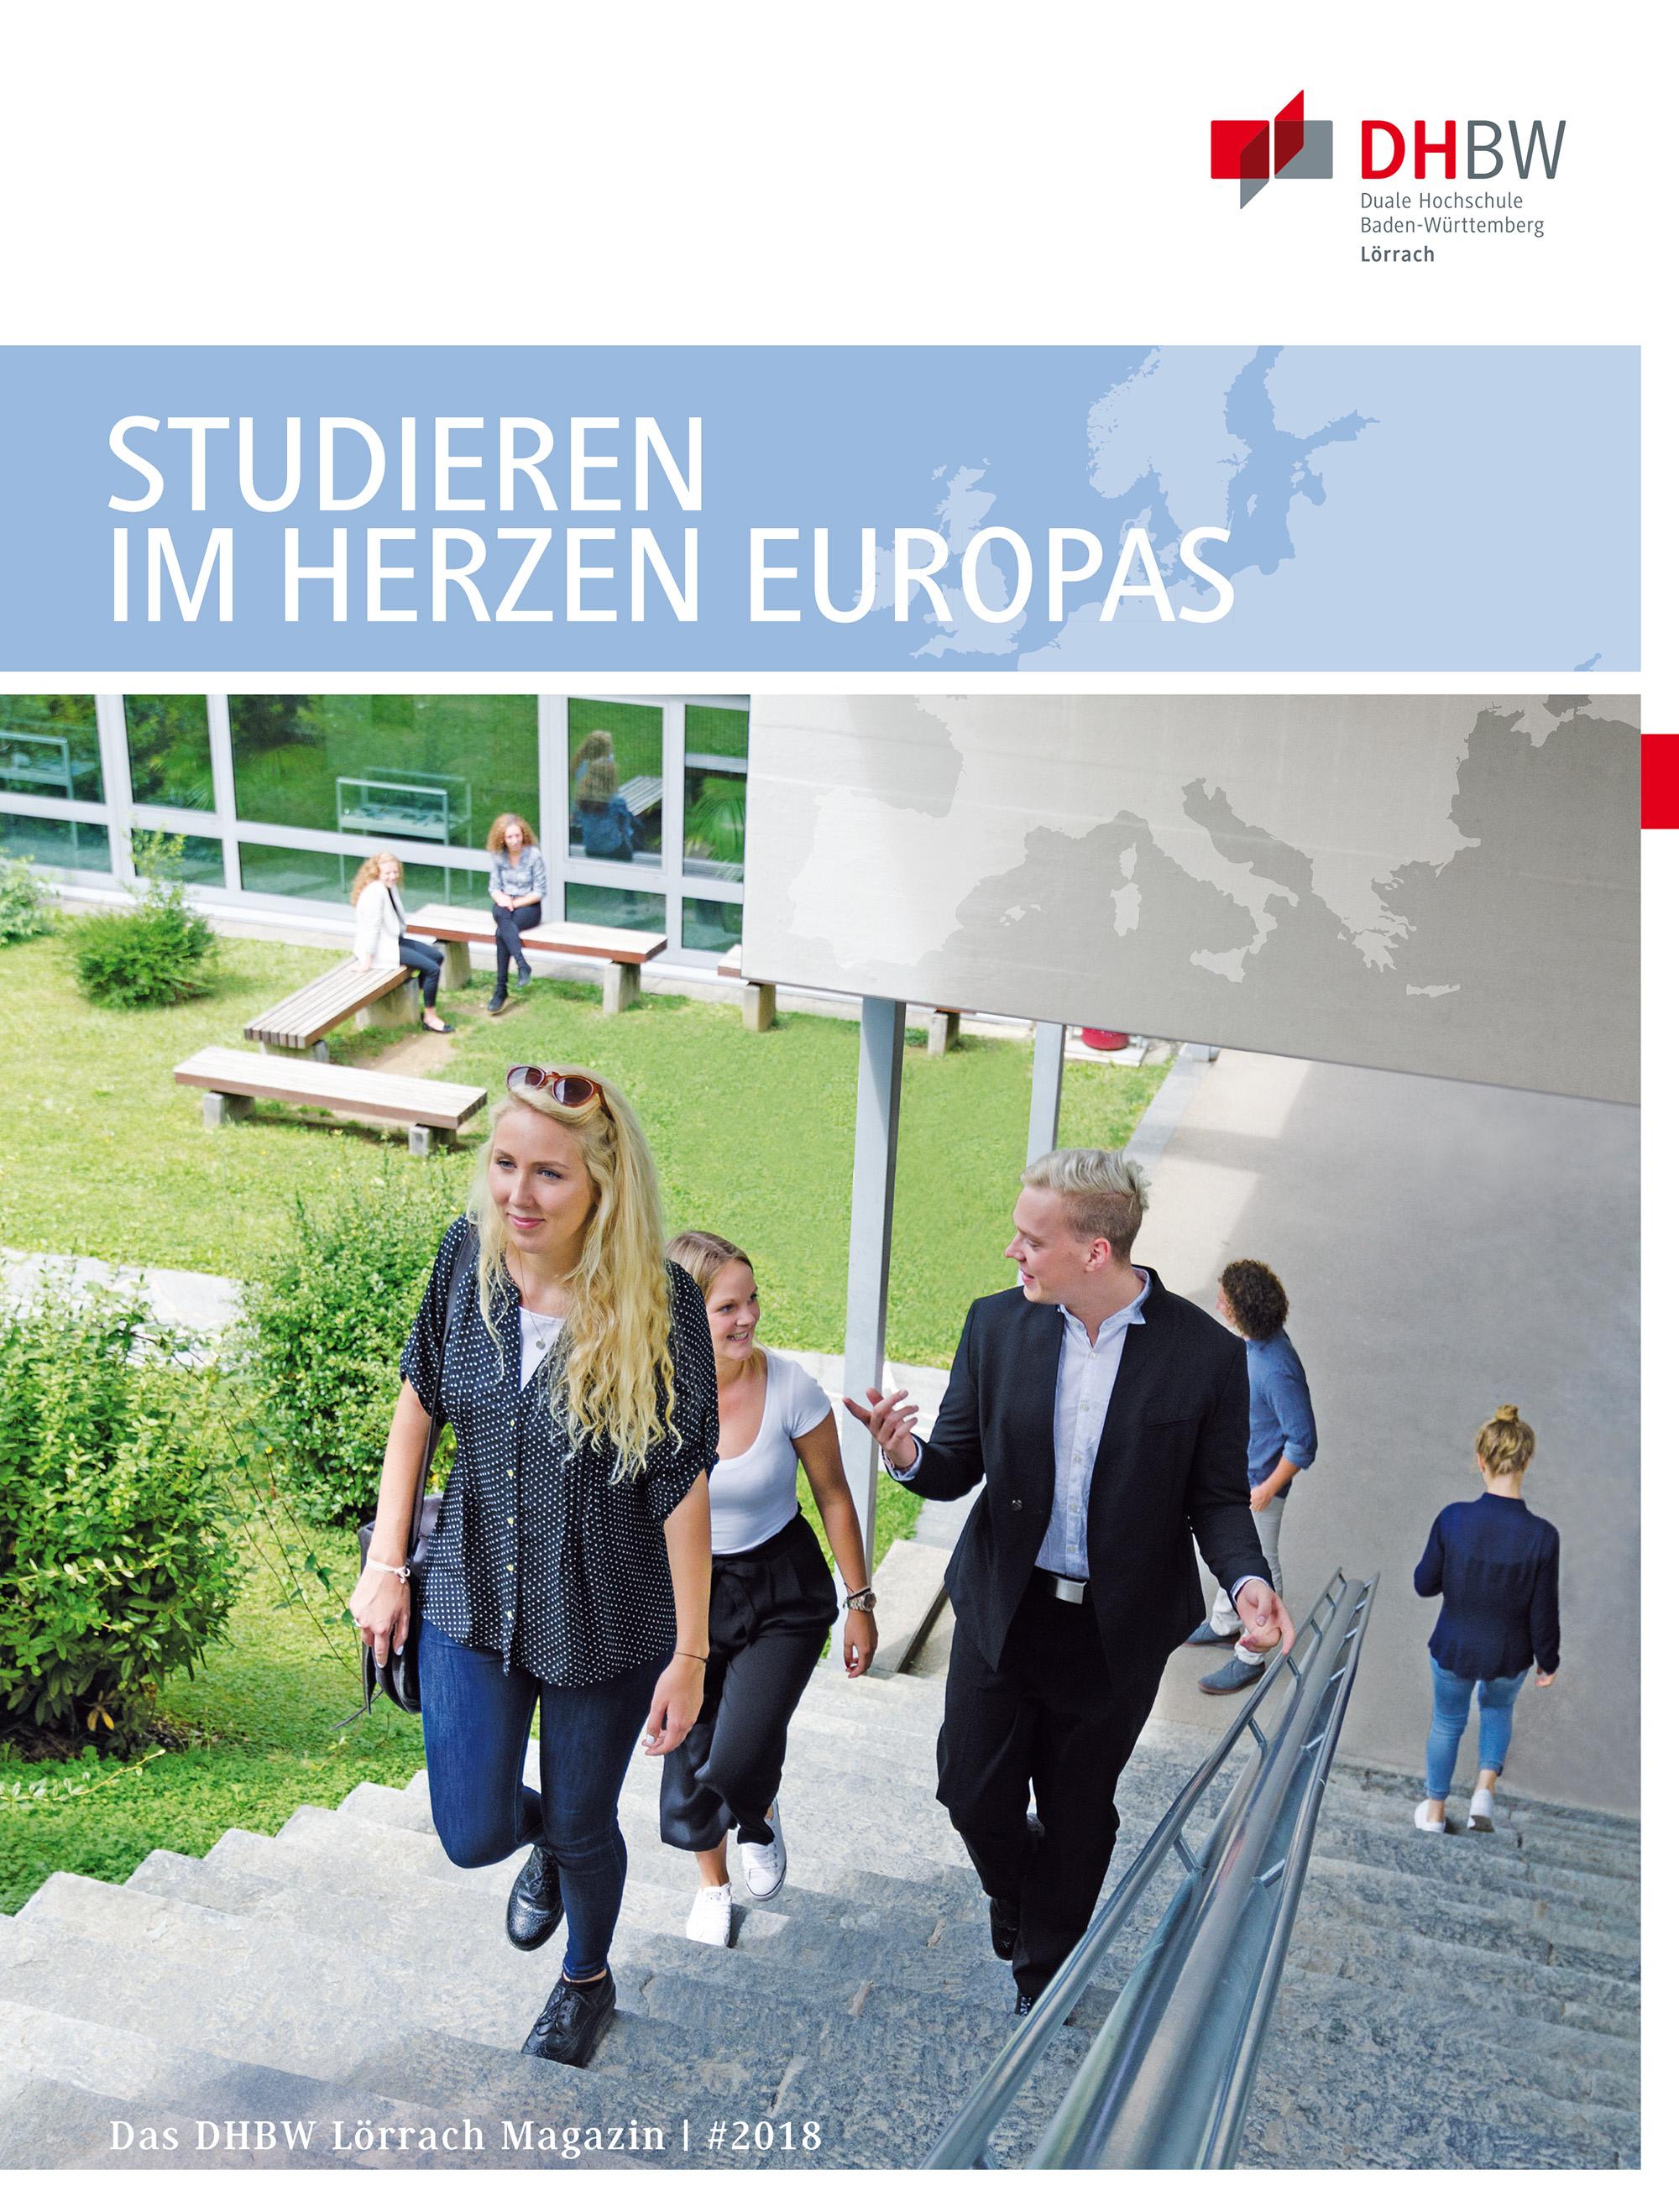 DHBW Lörrach Magazin Duales Studium